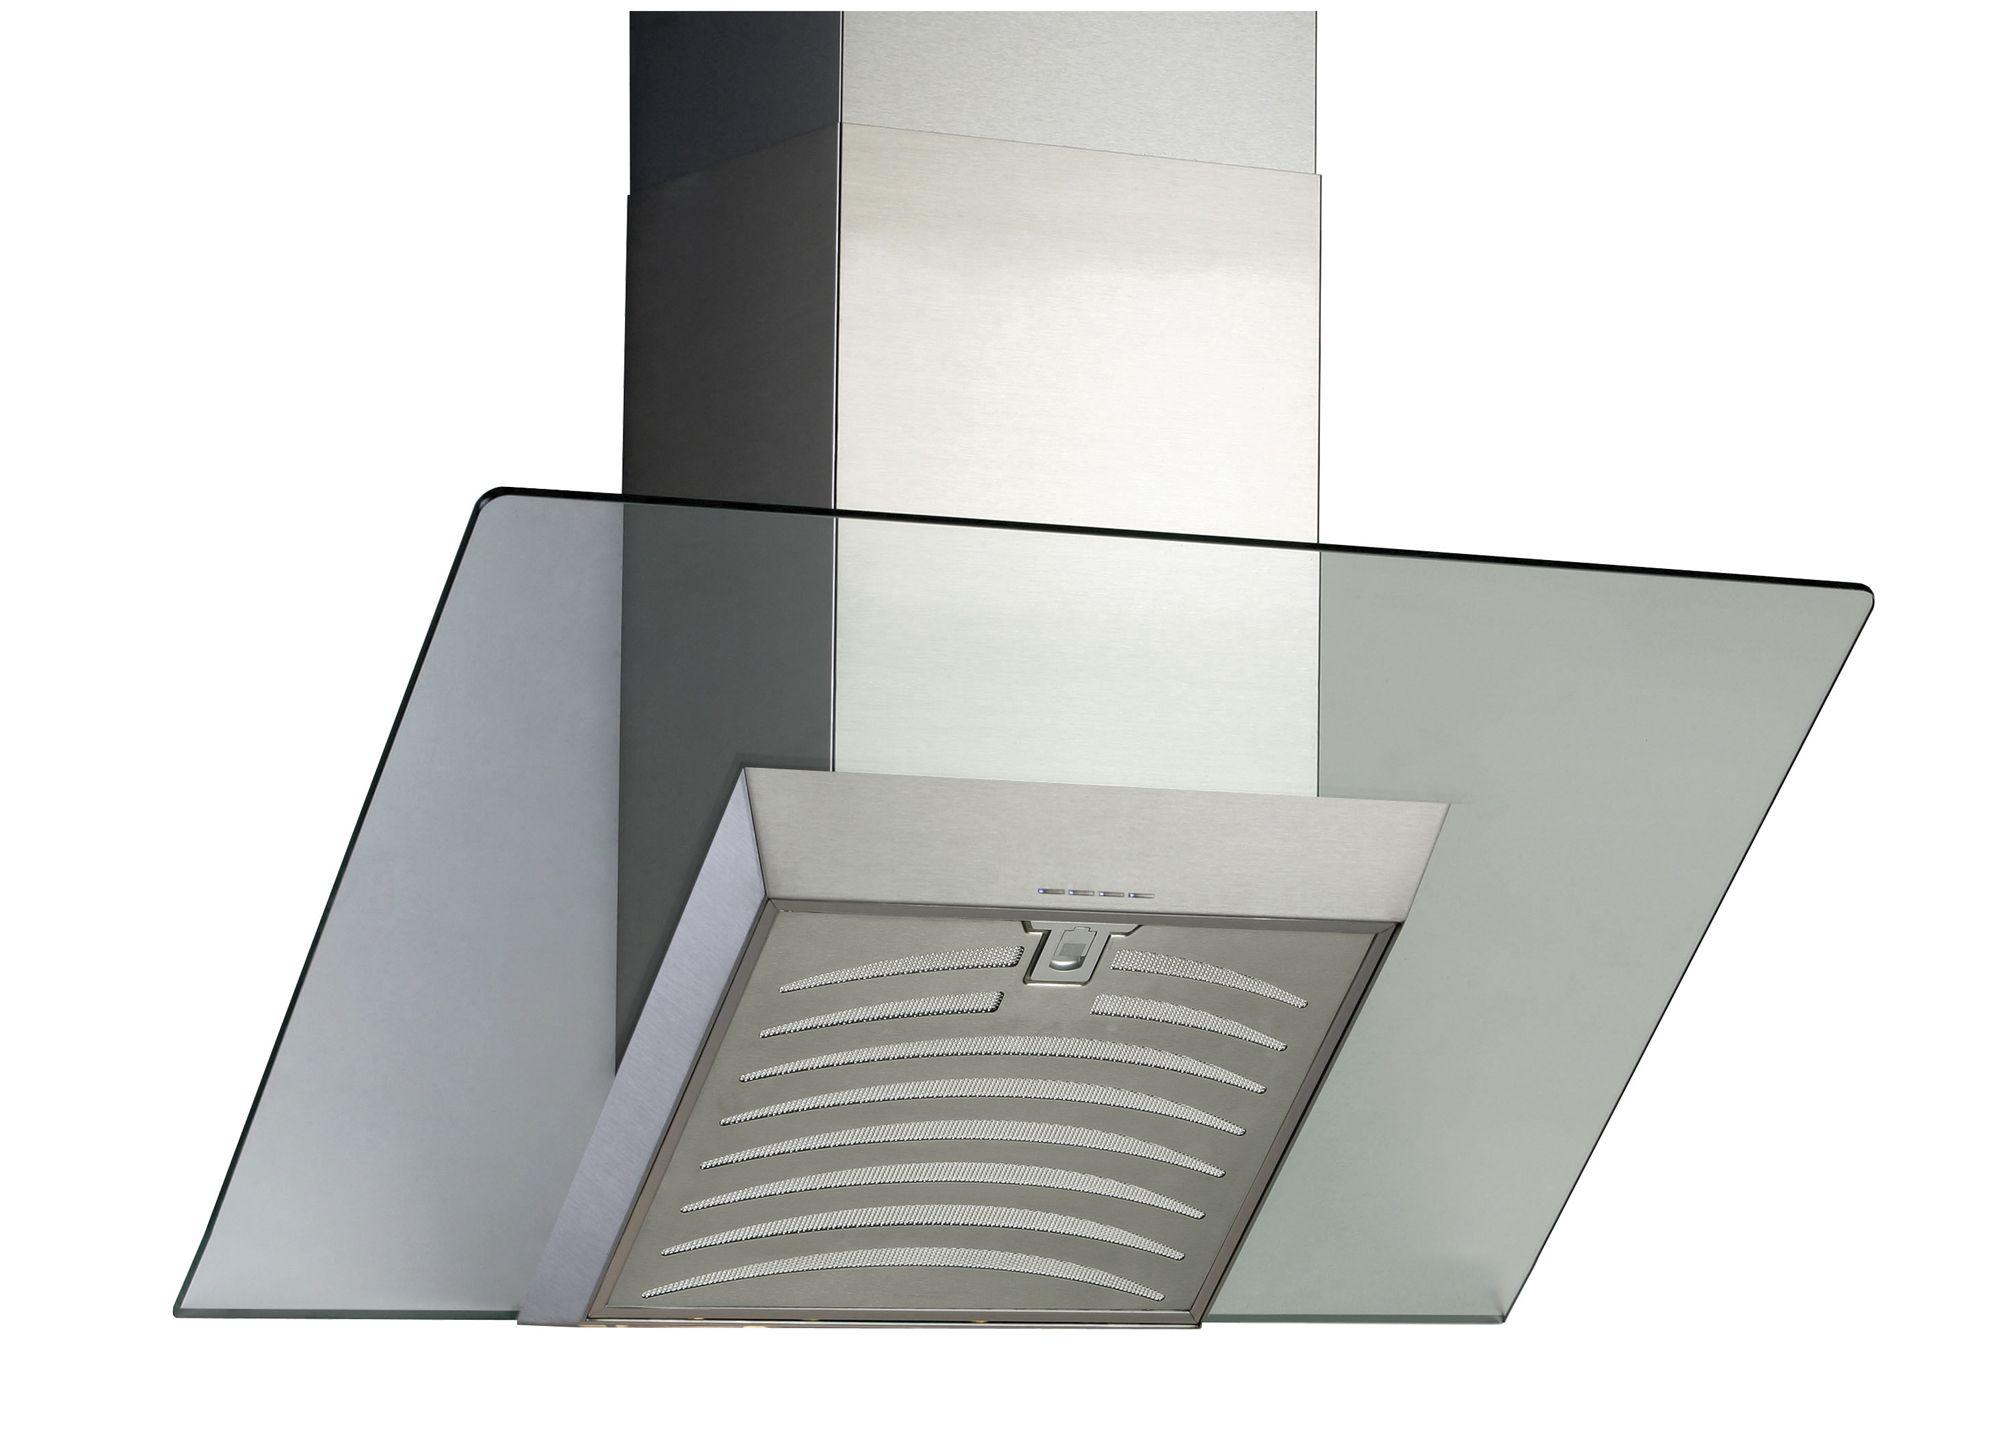 designair ags70ss steel glass angled cooker hood w. Black Bedroom Furniture Sets. Home Design Ideas